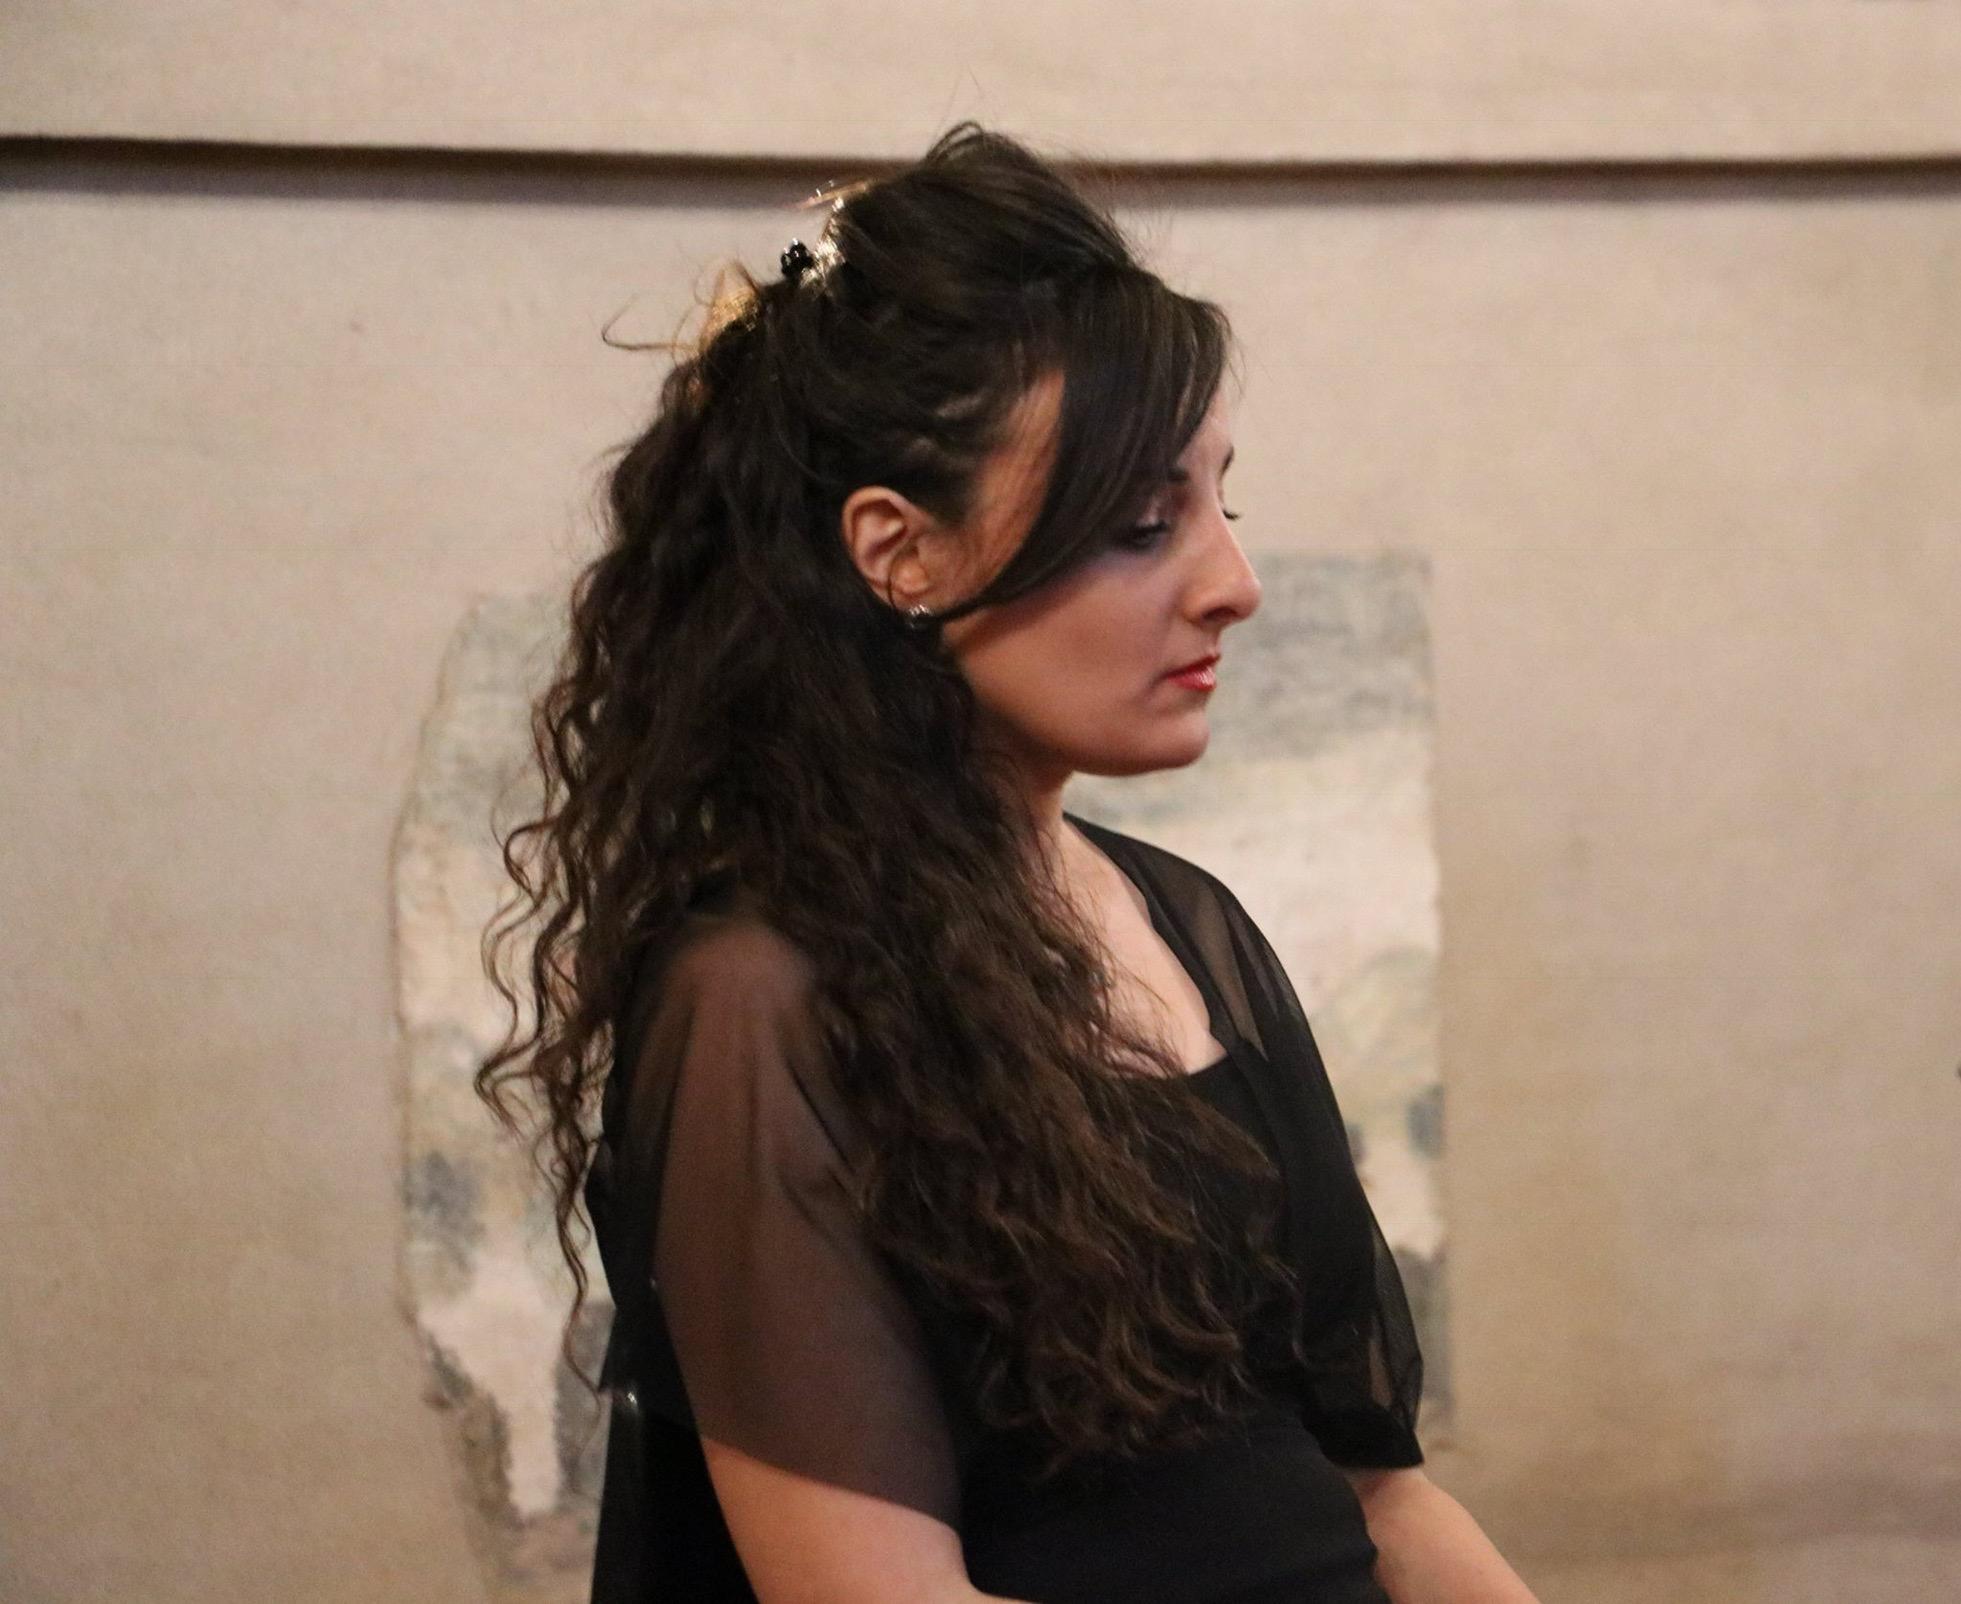 Dyana Bovolo